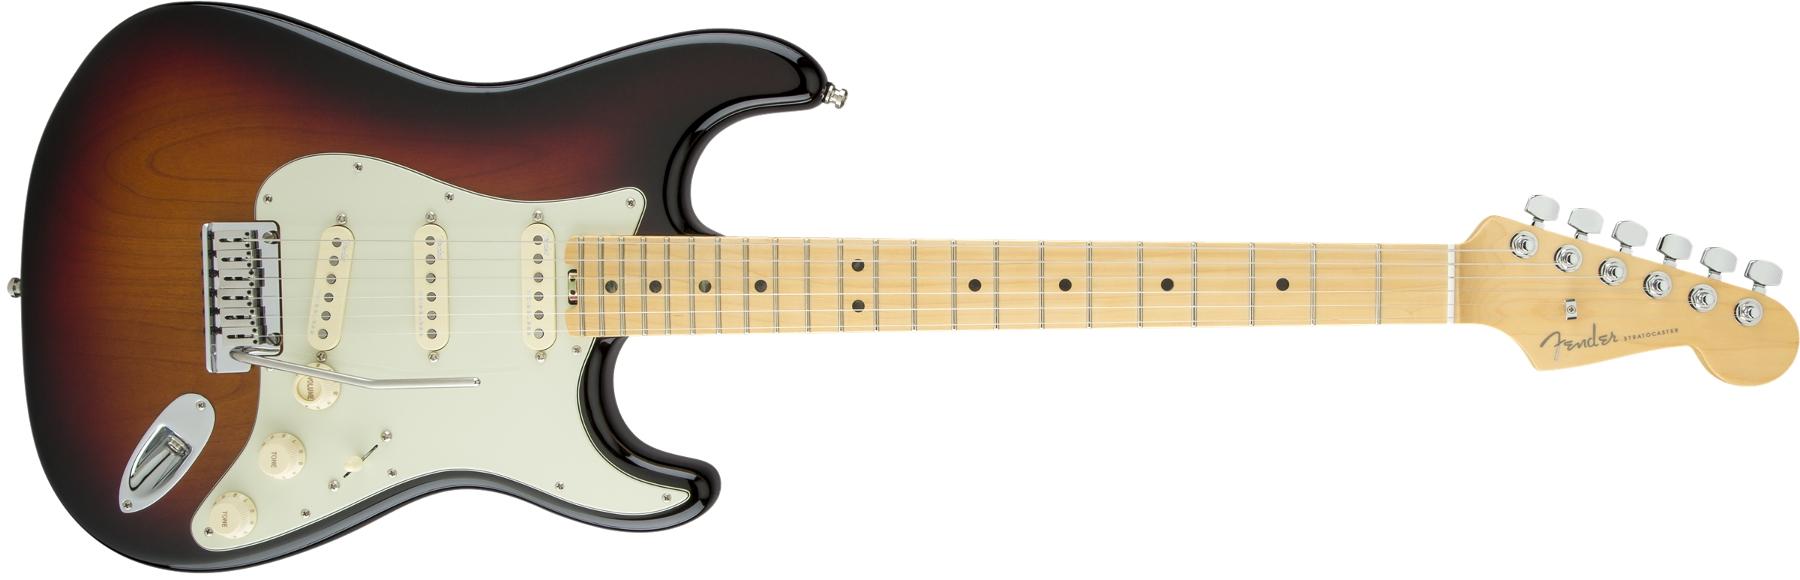 Fender American Elite Stratocaster Electric Guitar, 22-Fret, Maple Fingerboard STRAT-AMELITE-MPL